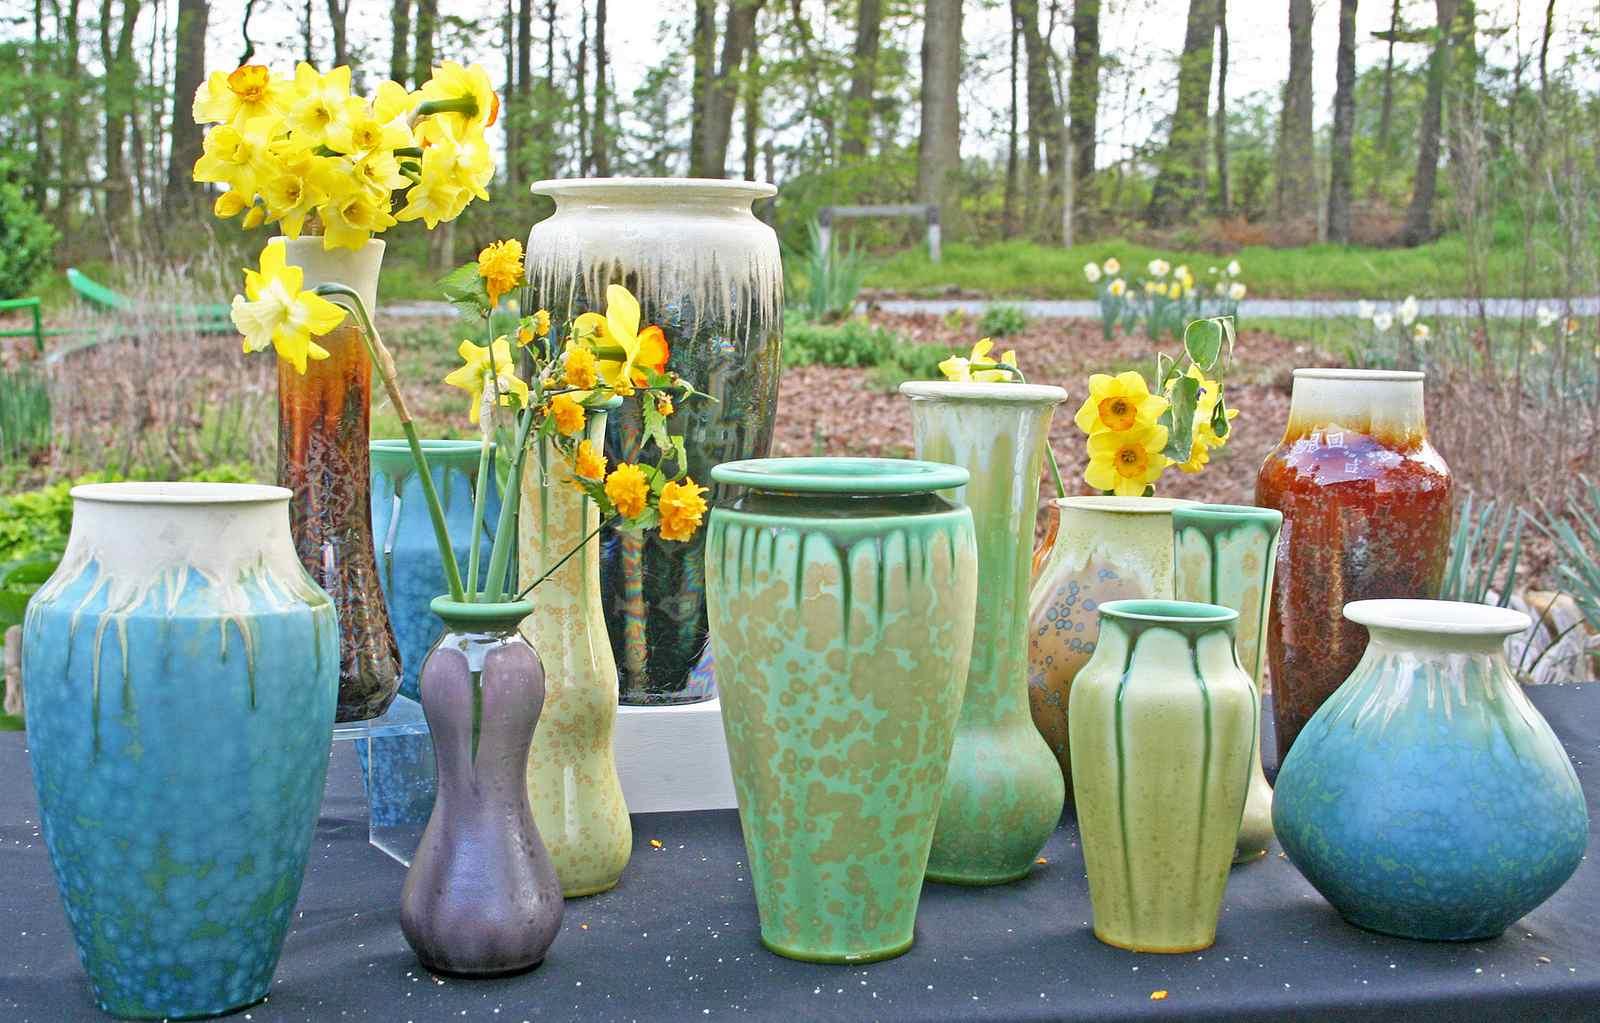 multiple colorful crystalline glaze vases